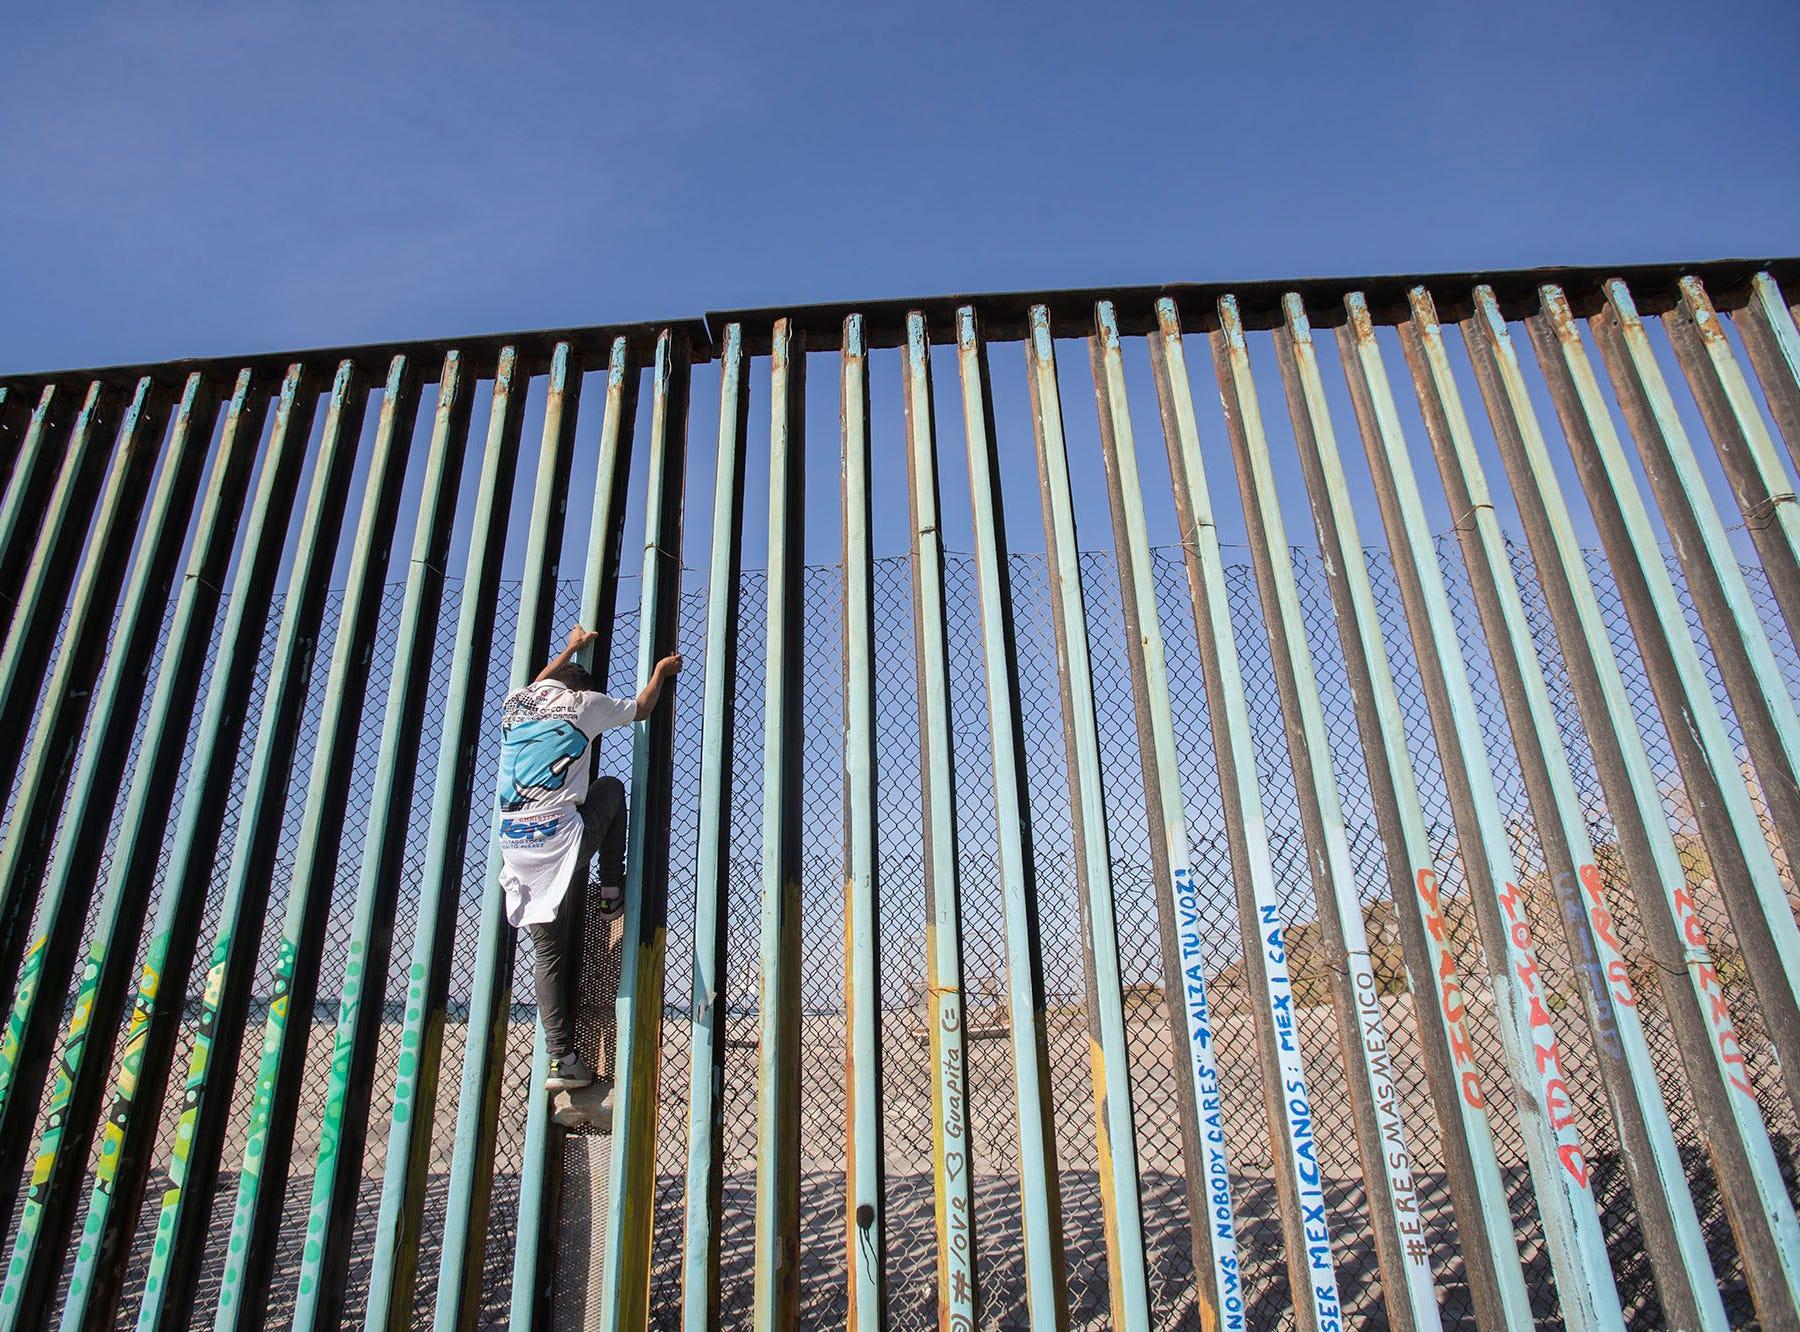 Members of the fist wave of the migrant caravan visit Playas De Tijuana after arriving in Tijuana, Mexico on Nov. 13, 2018.